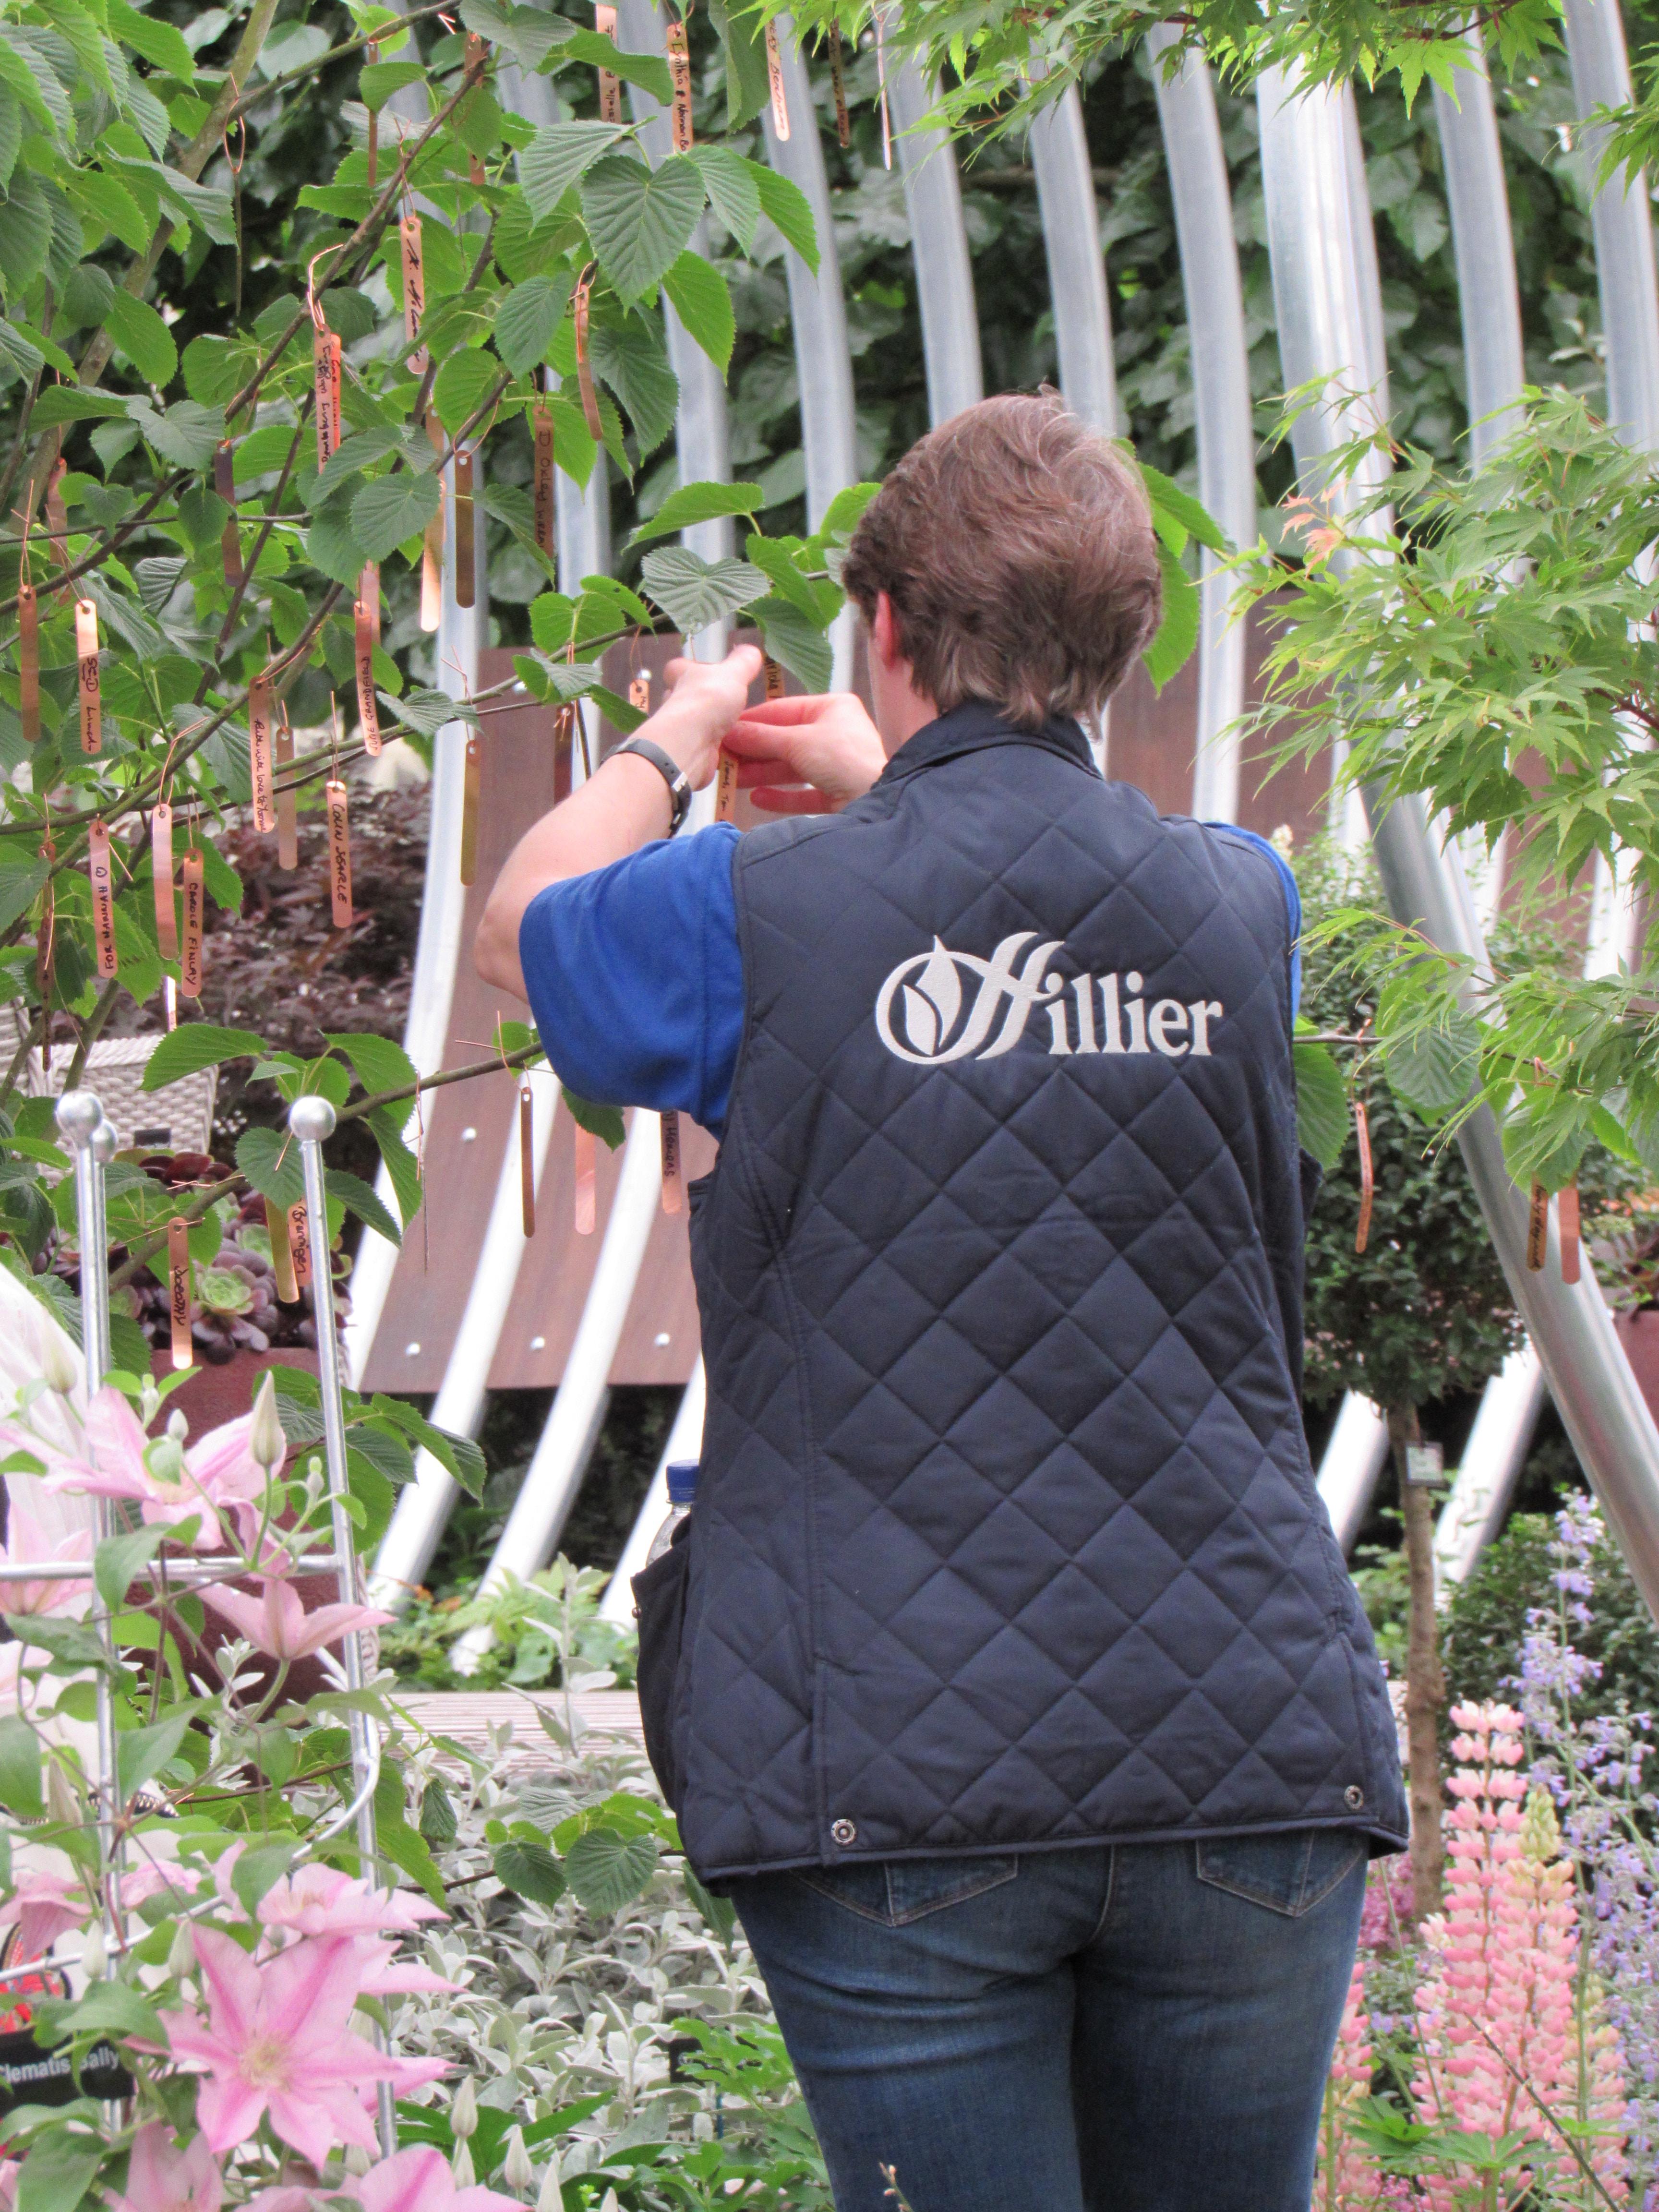 b99fddd2f0b ... experts in supplying Garden Centre Uniforms